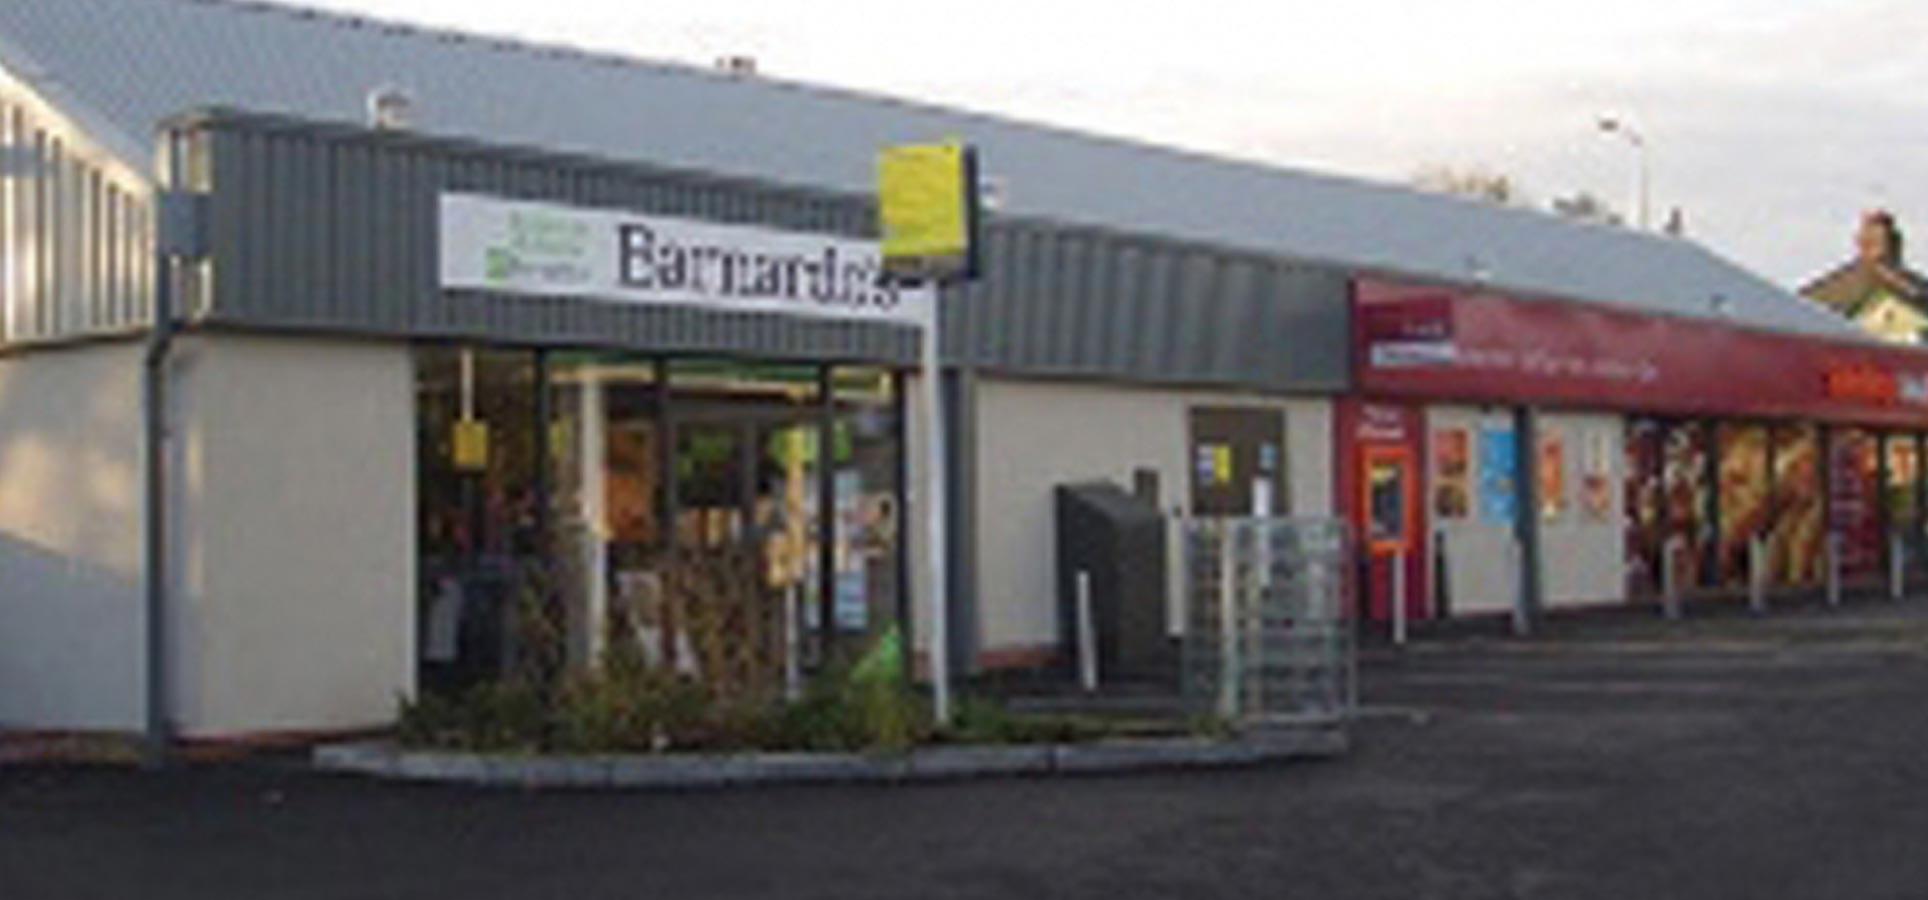 SAINSBURY'S & BARNARDO'S, Jessops Construction Ltd